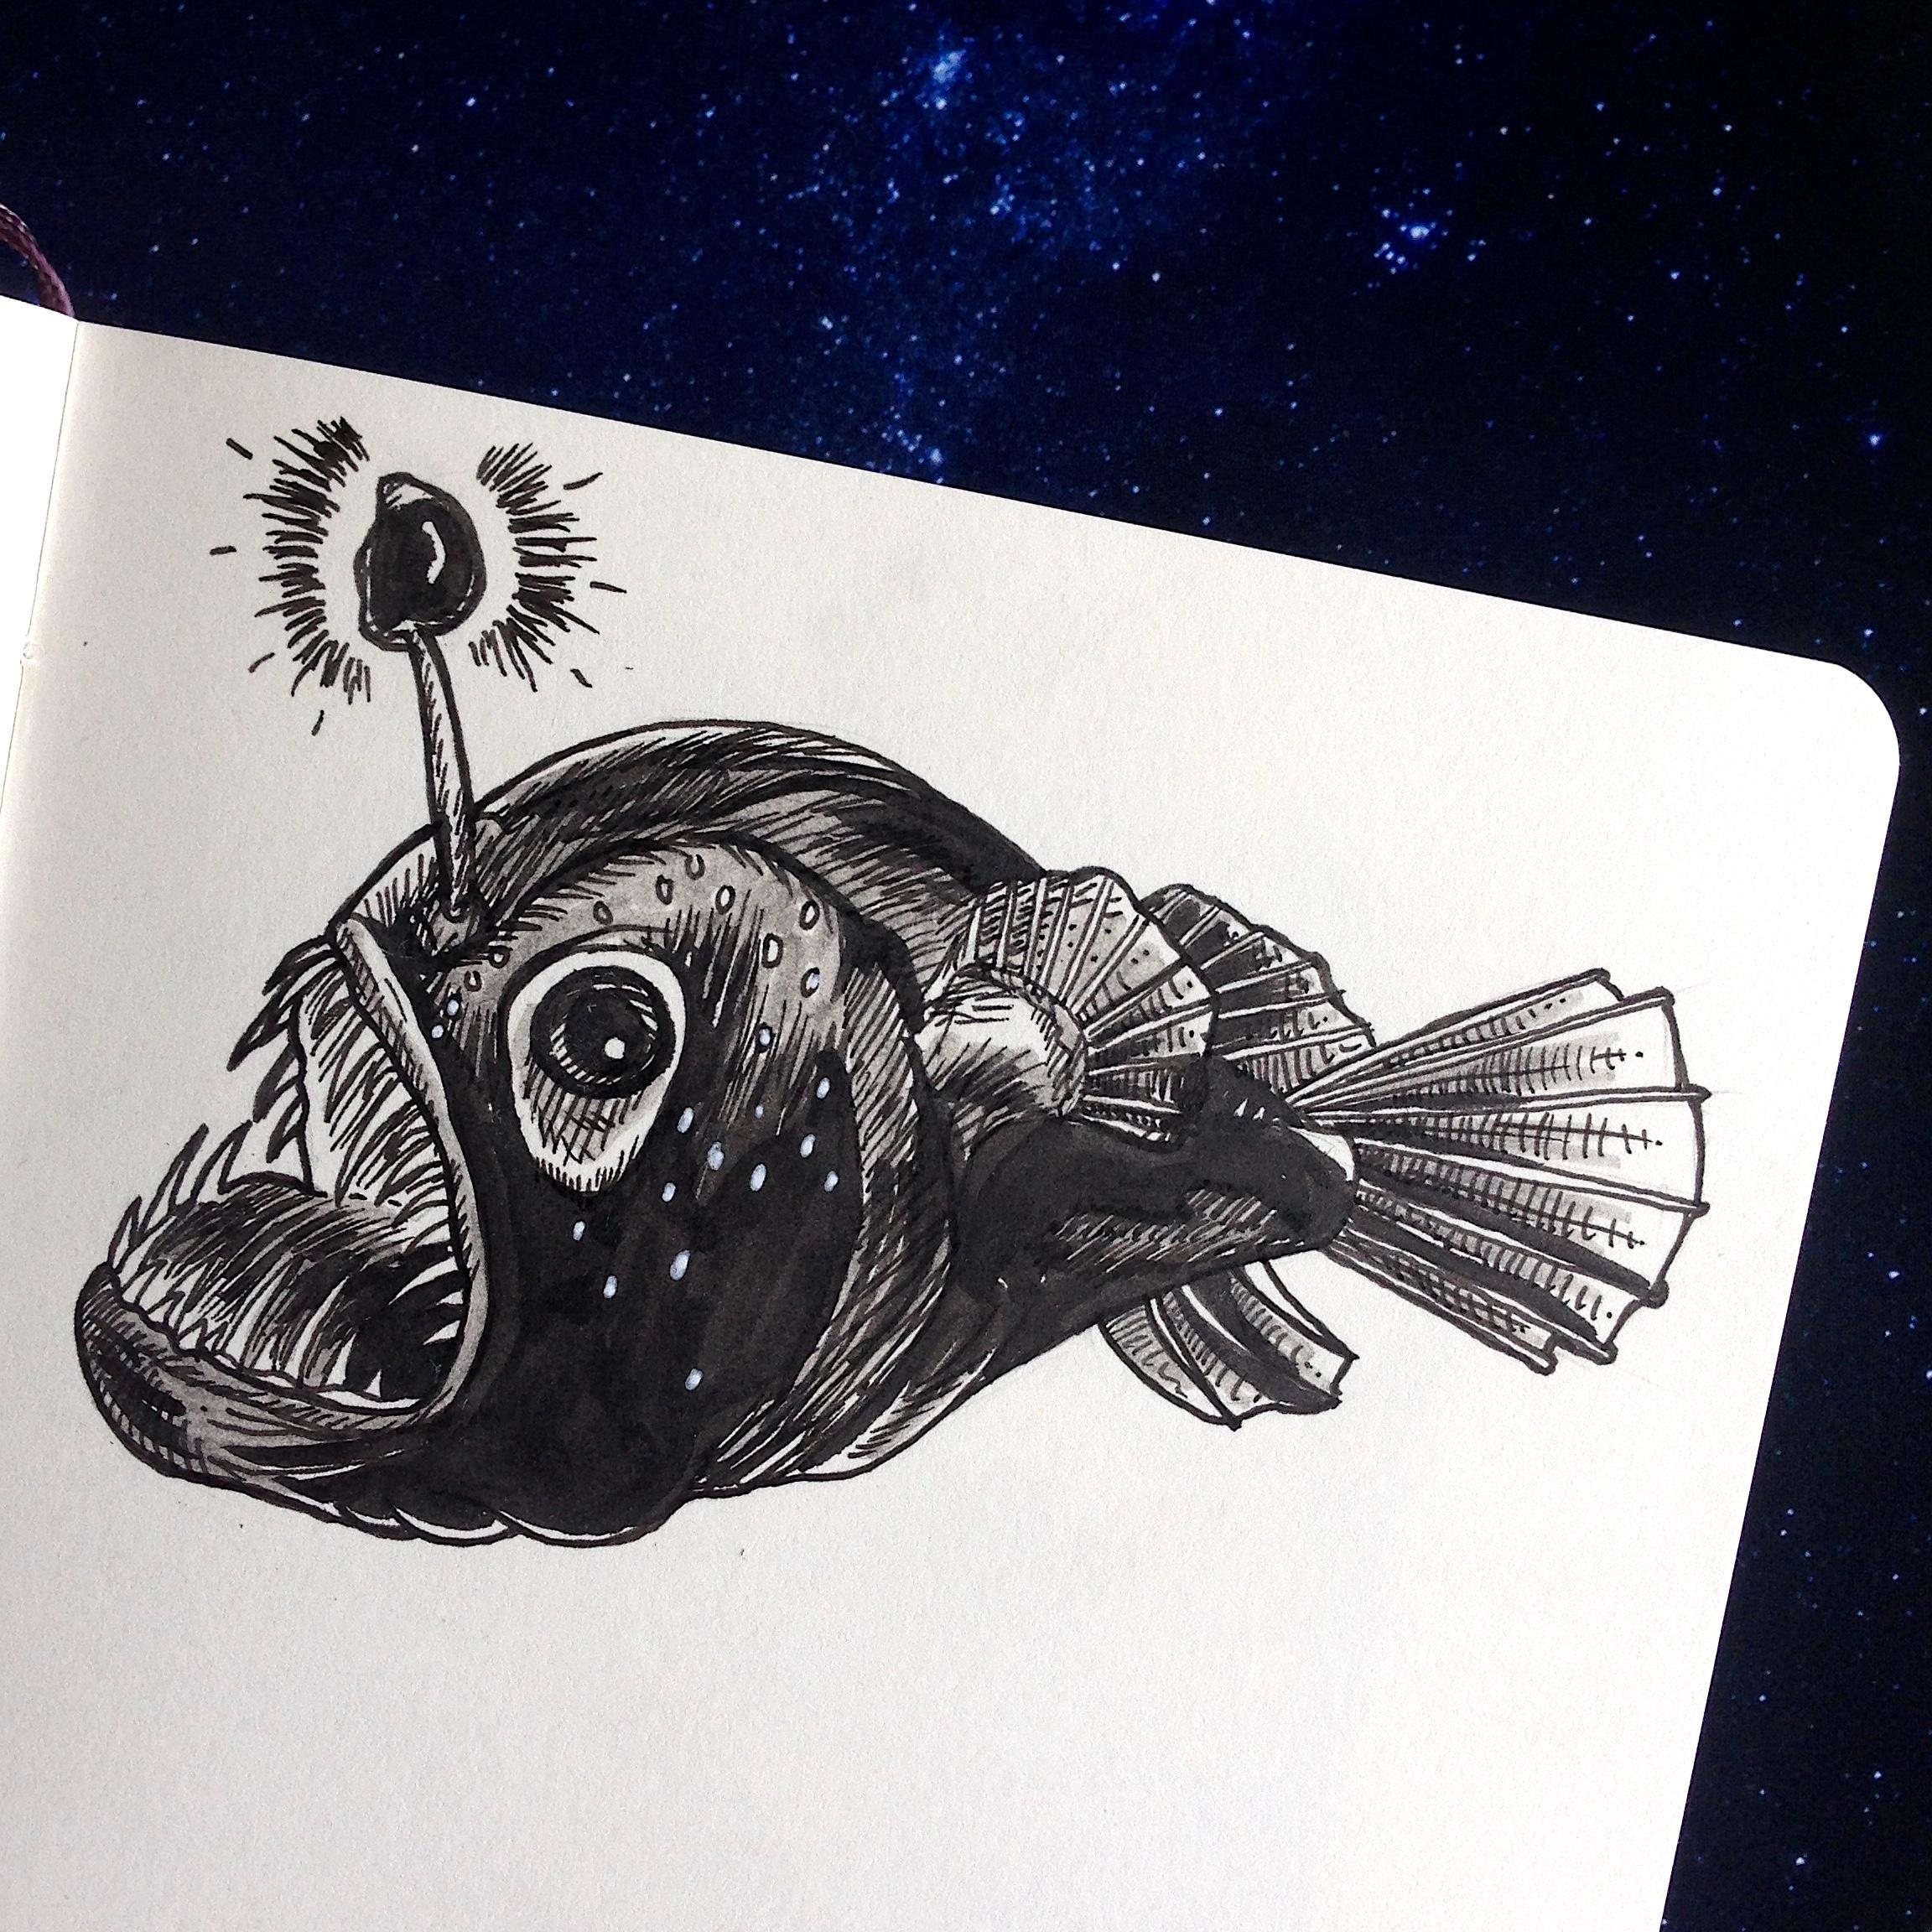 Day Fourteen - Lanternfish